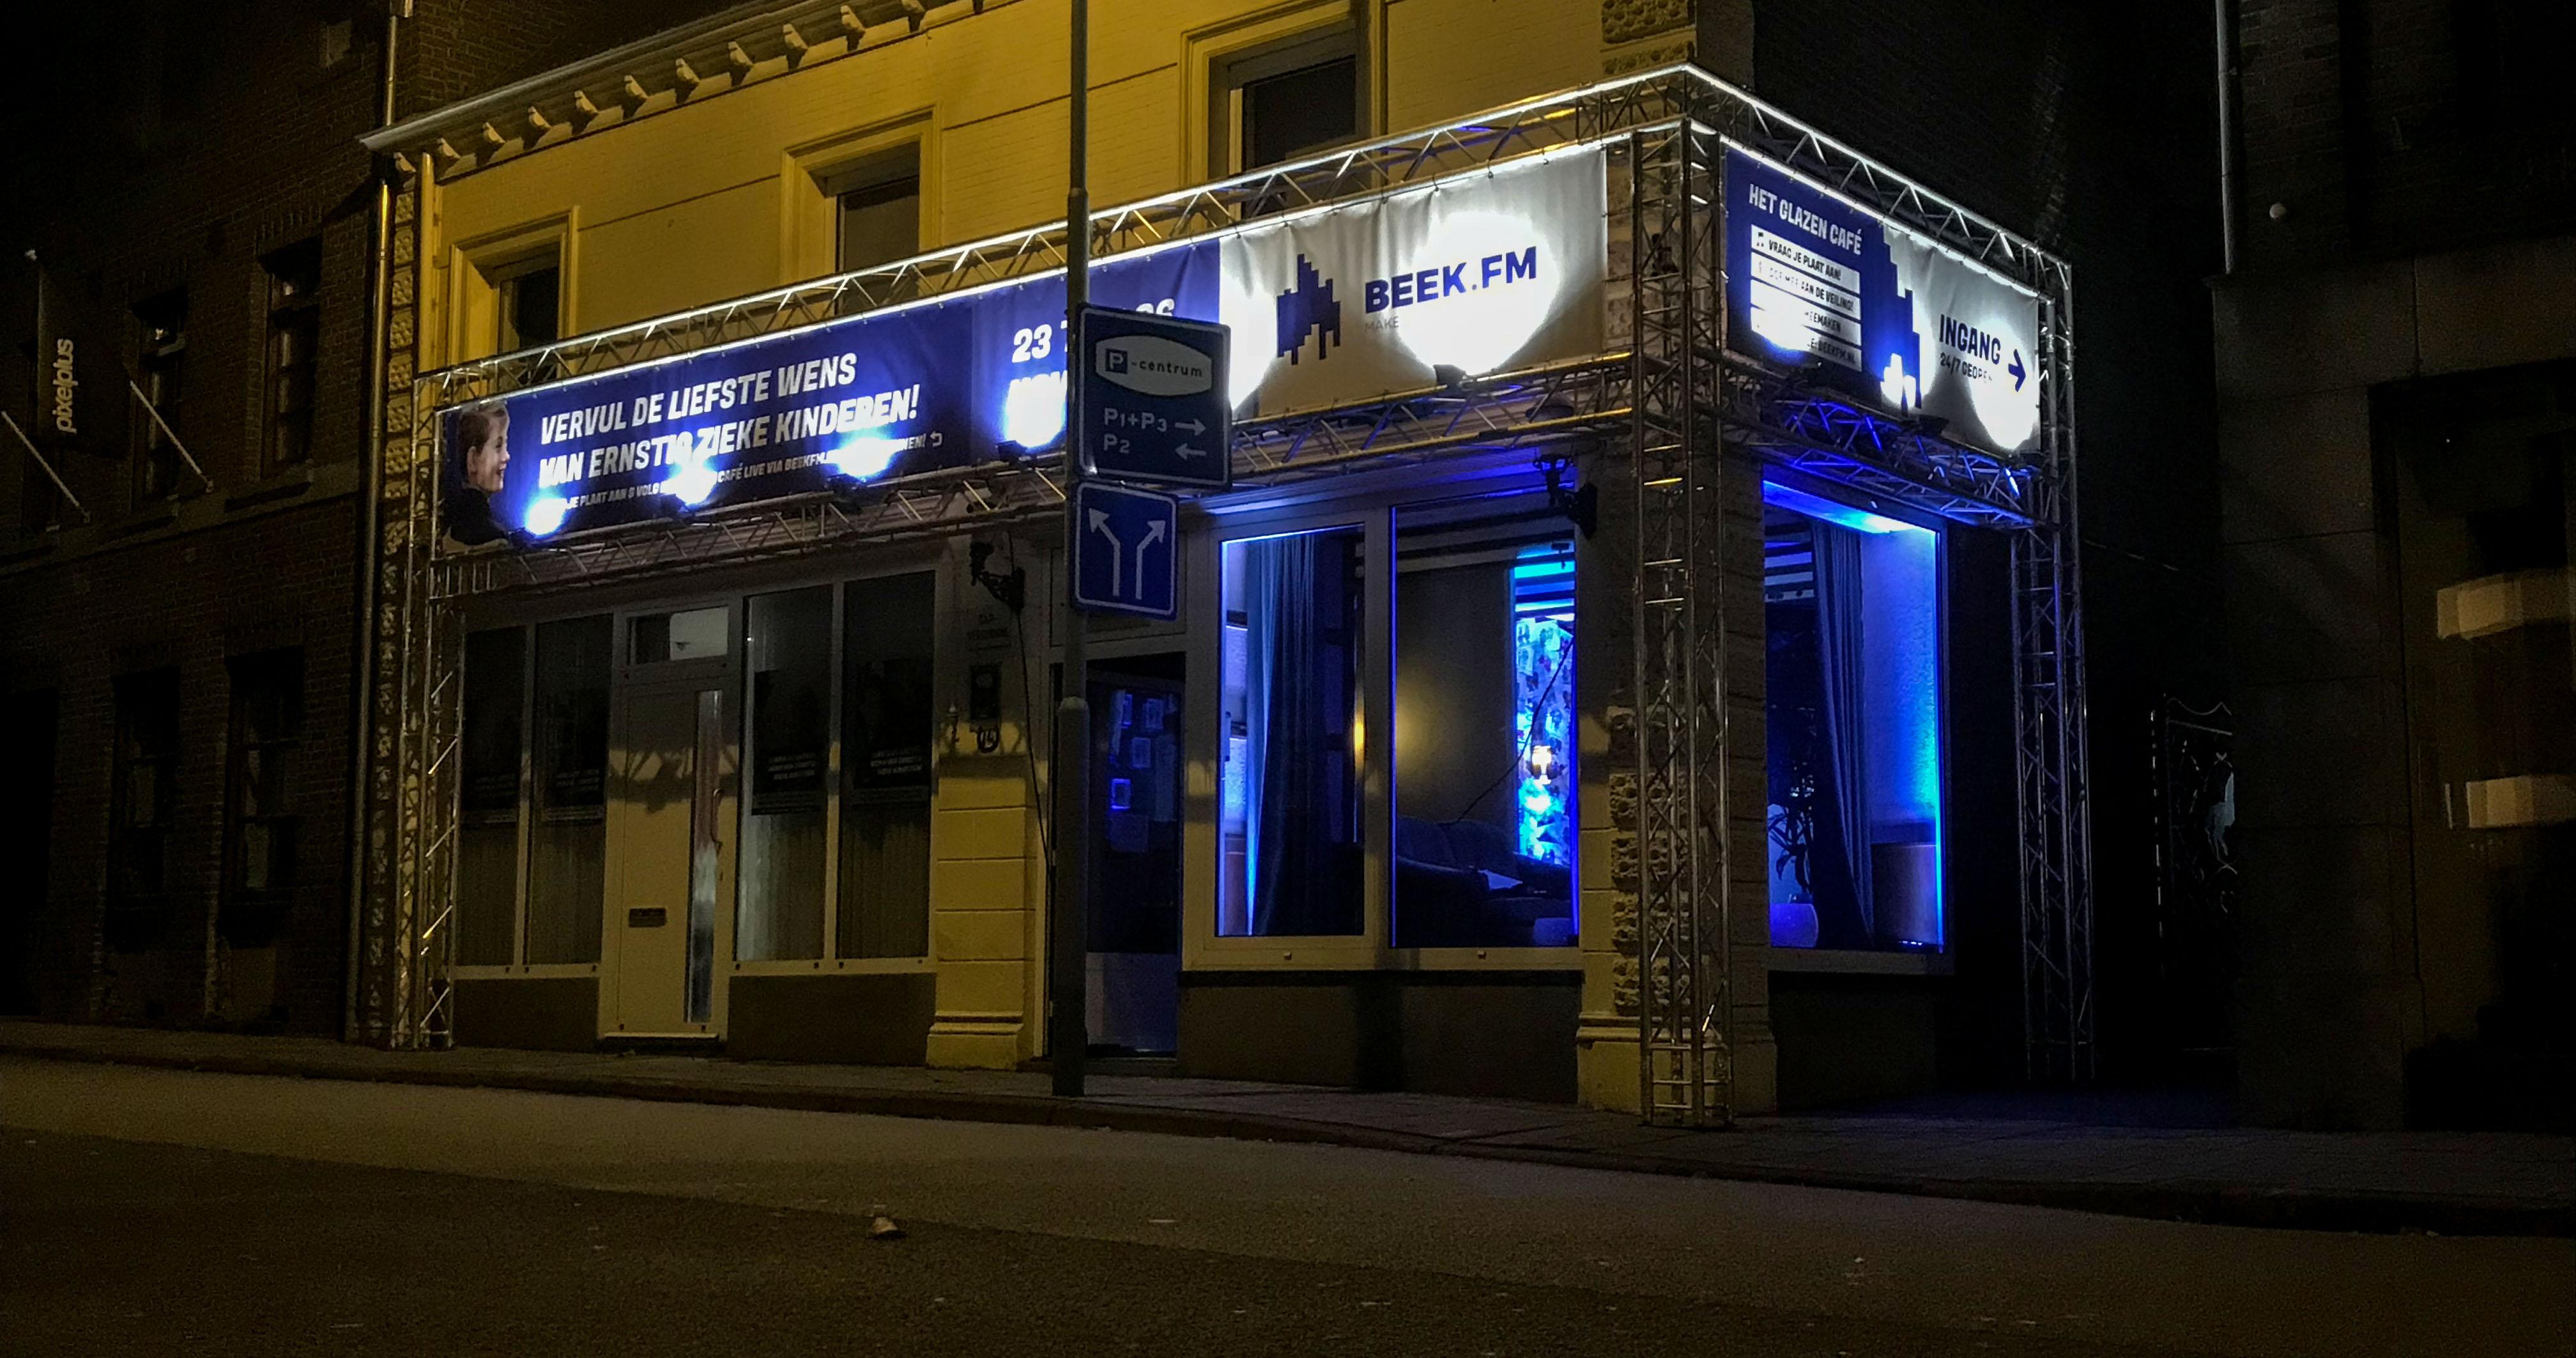 Beek FM introduceert nachtgast in nieuwe Glazen Café